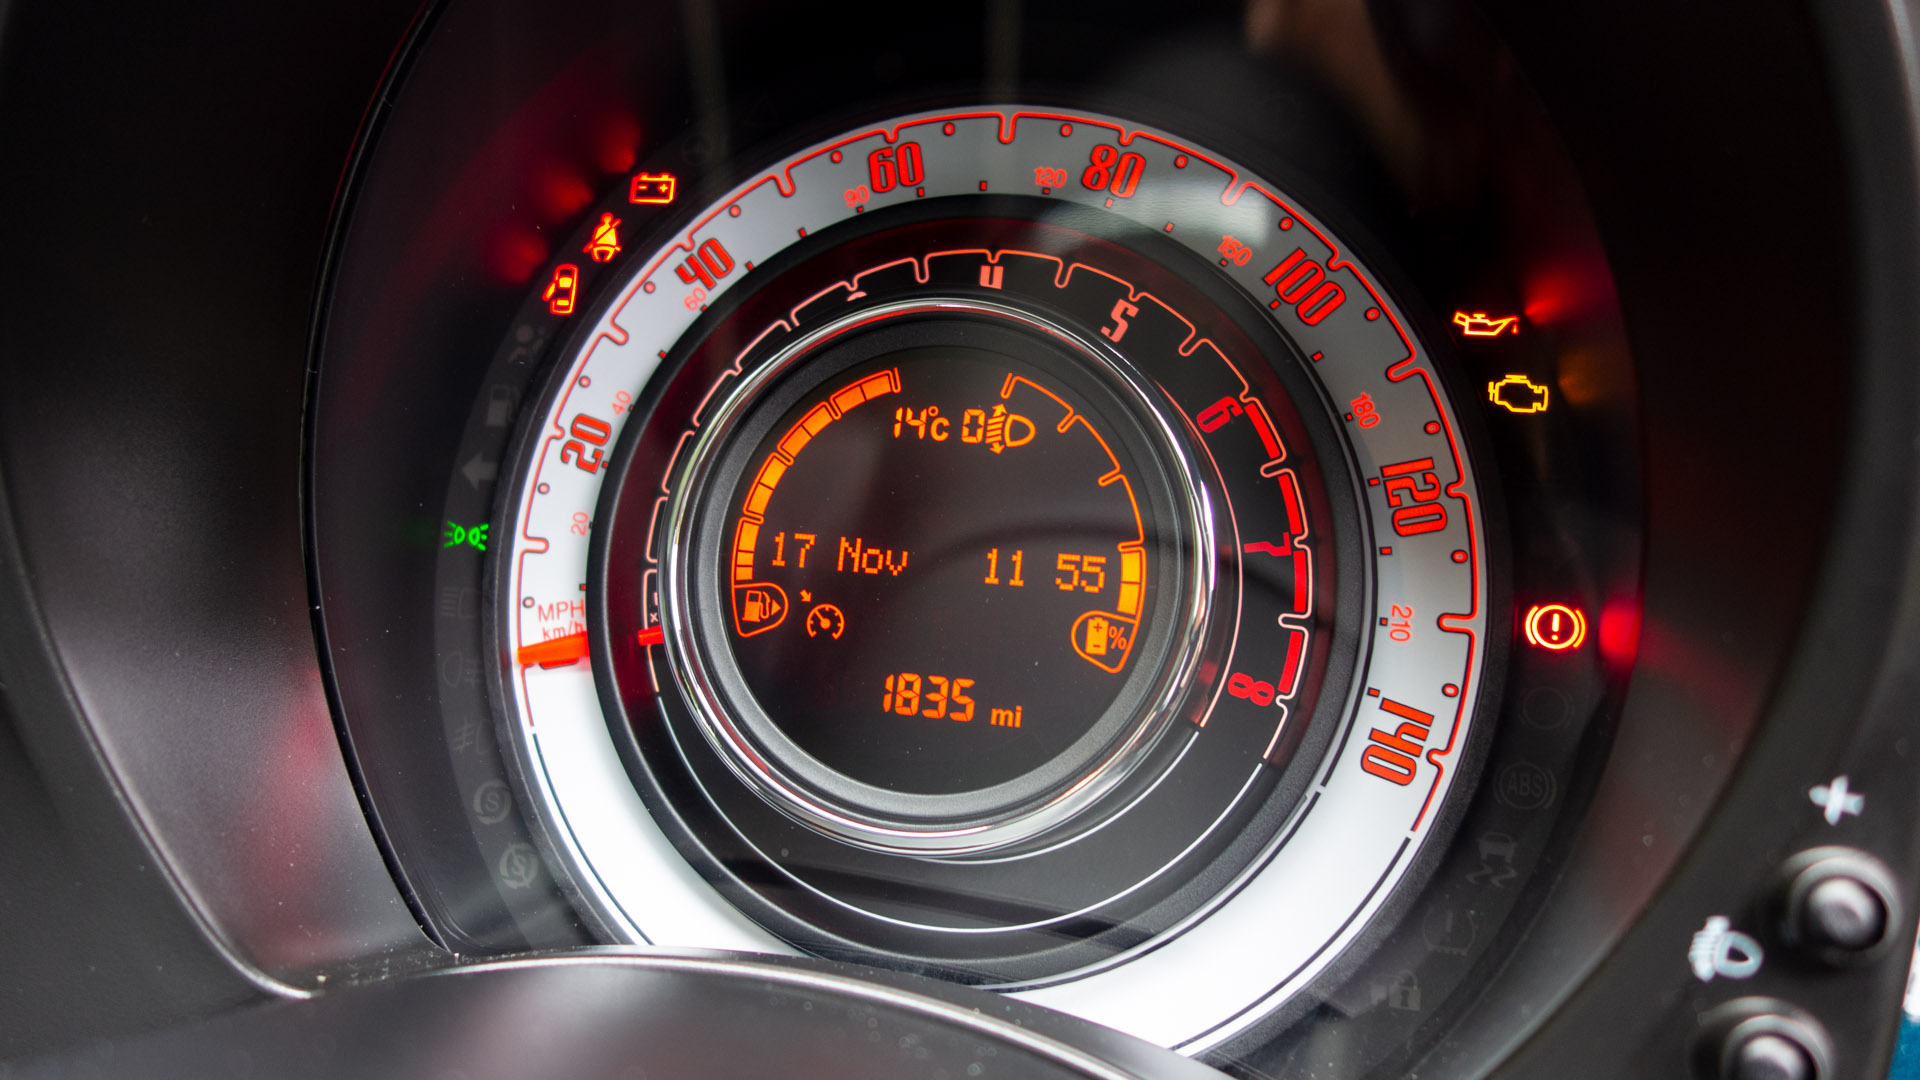 Fiat 500 Hybrid instrument cluster